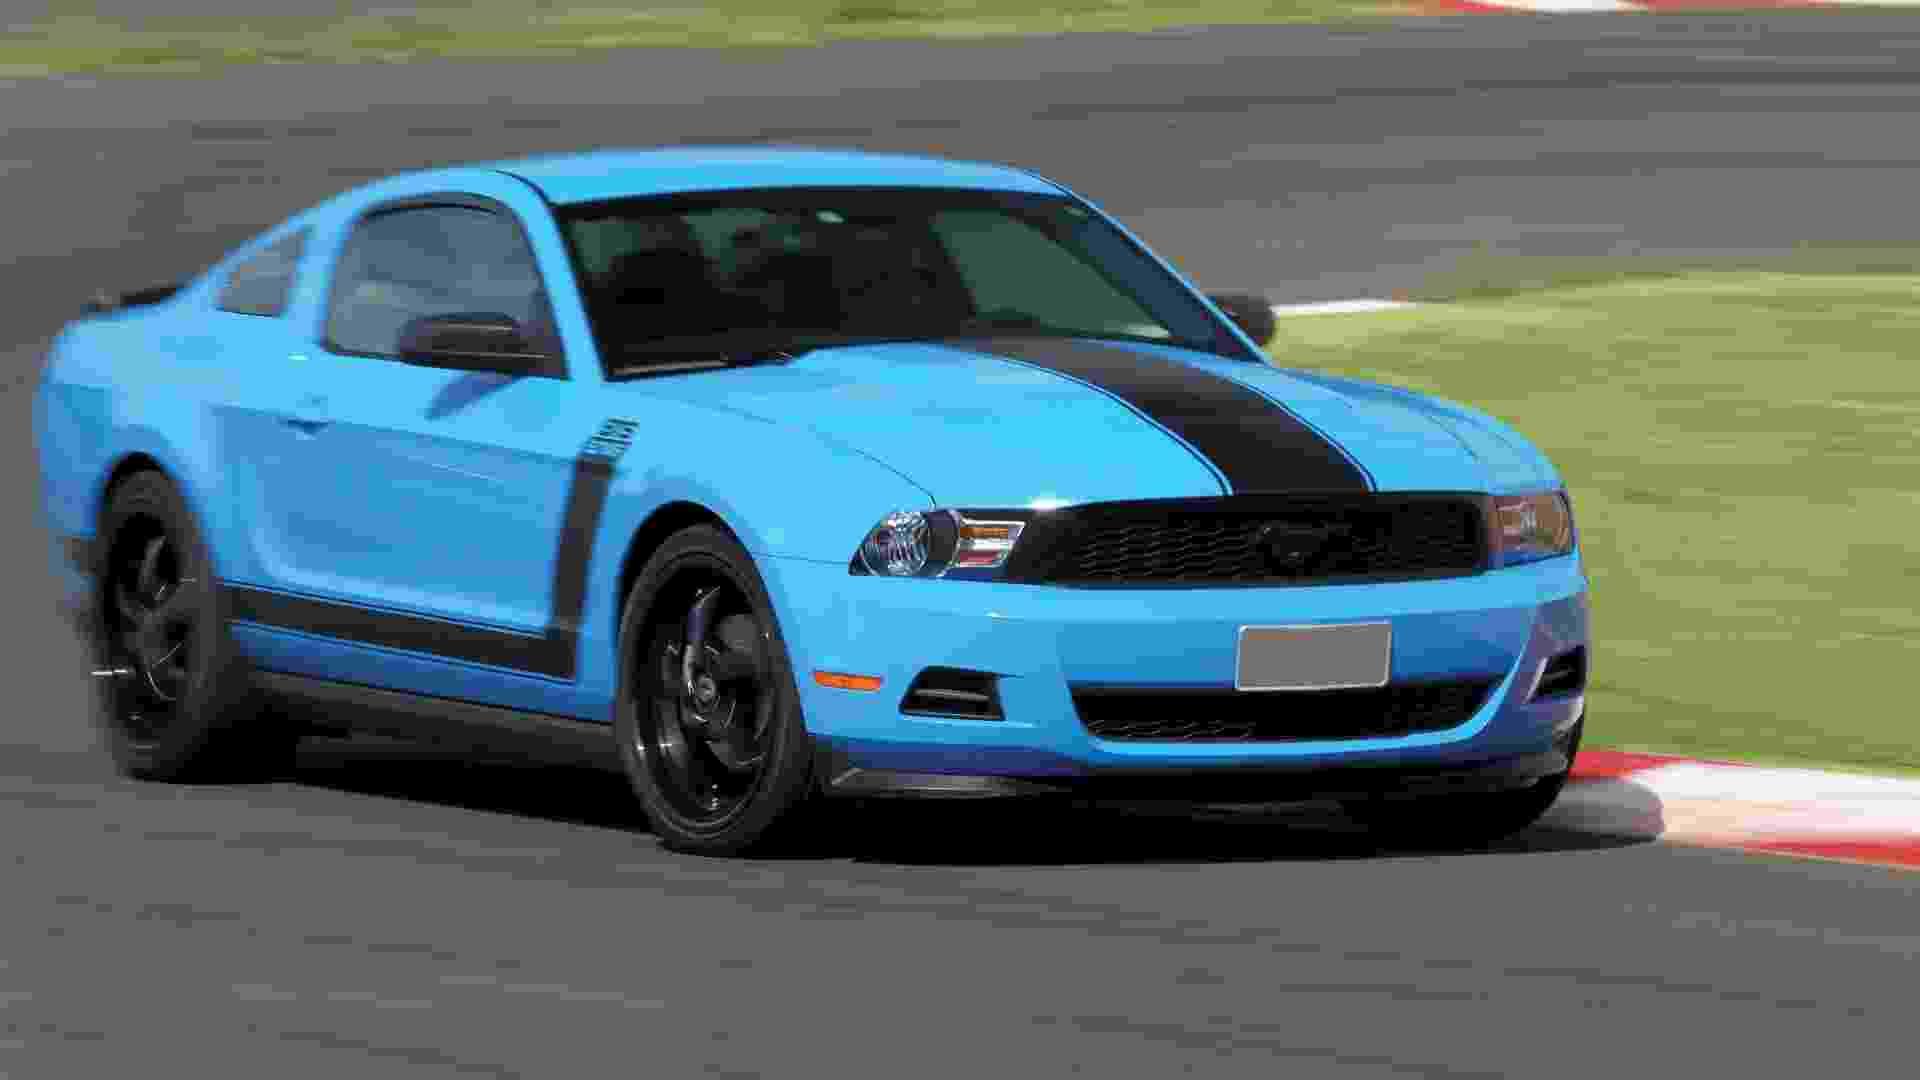 Ford Mustang V6 Fullpower - João Mantovani/Fullpower